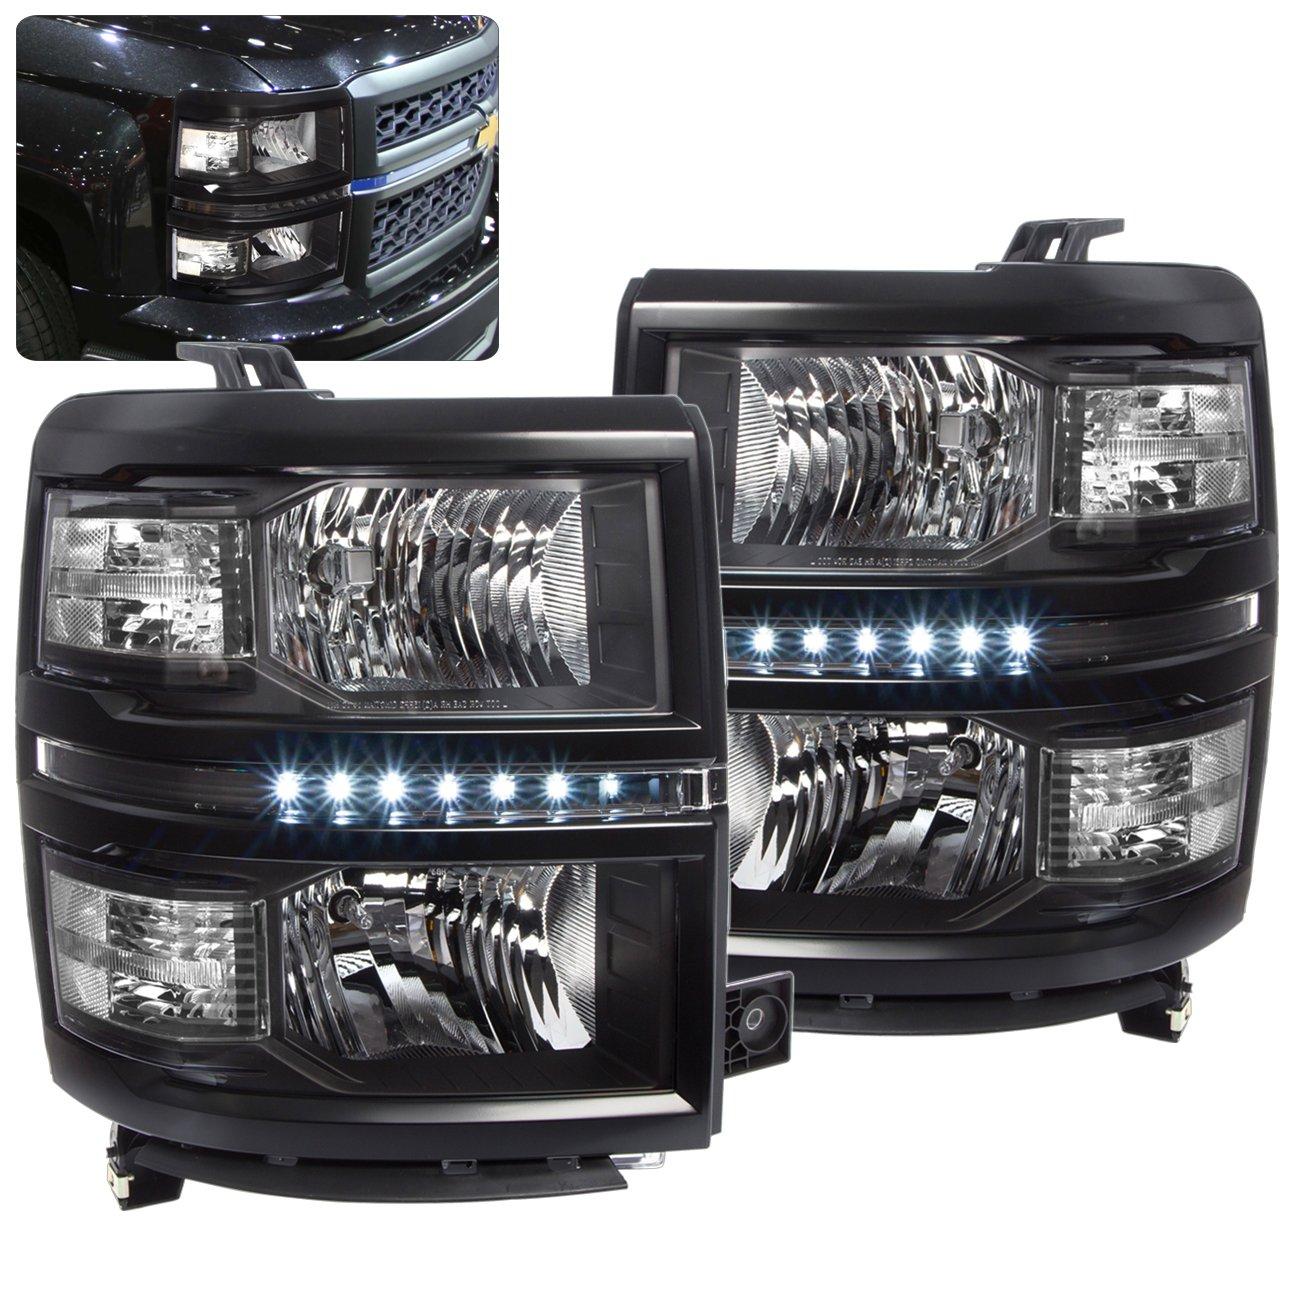 Chevy Silverado 1500 Black Housing Led Headlights Lamp 77 Headlight Wiring Harness Clear Corner Turn Signal Reflectors Automotive